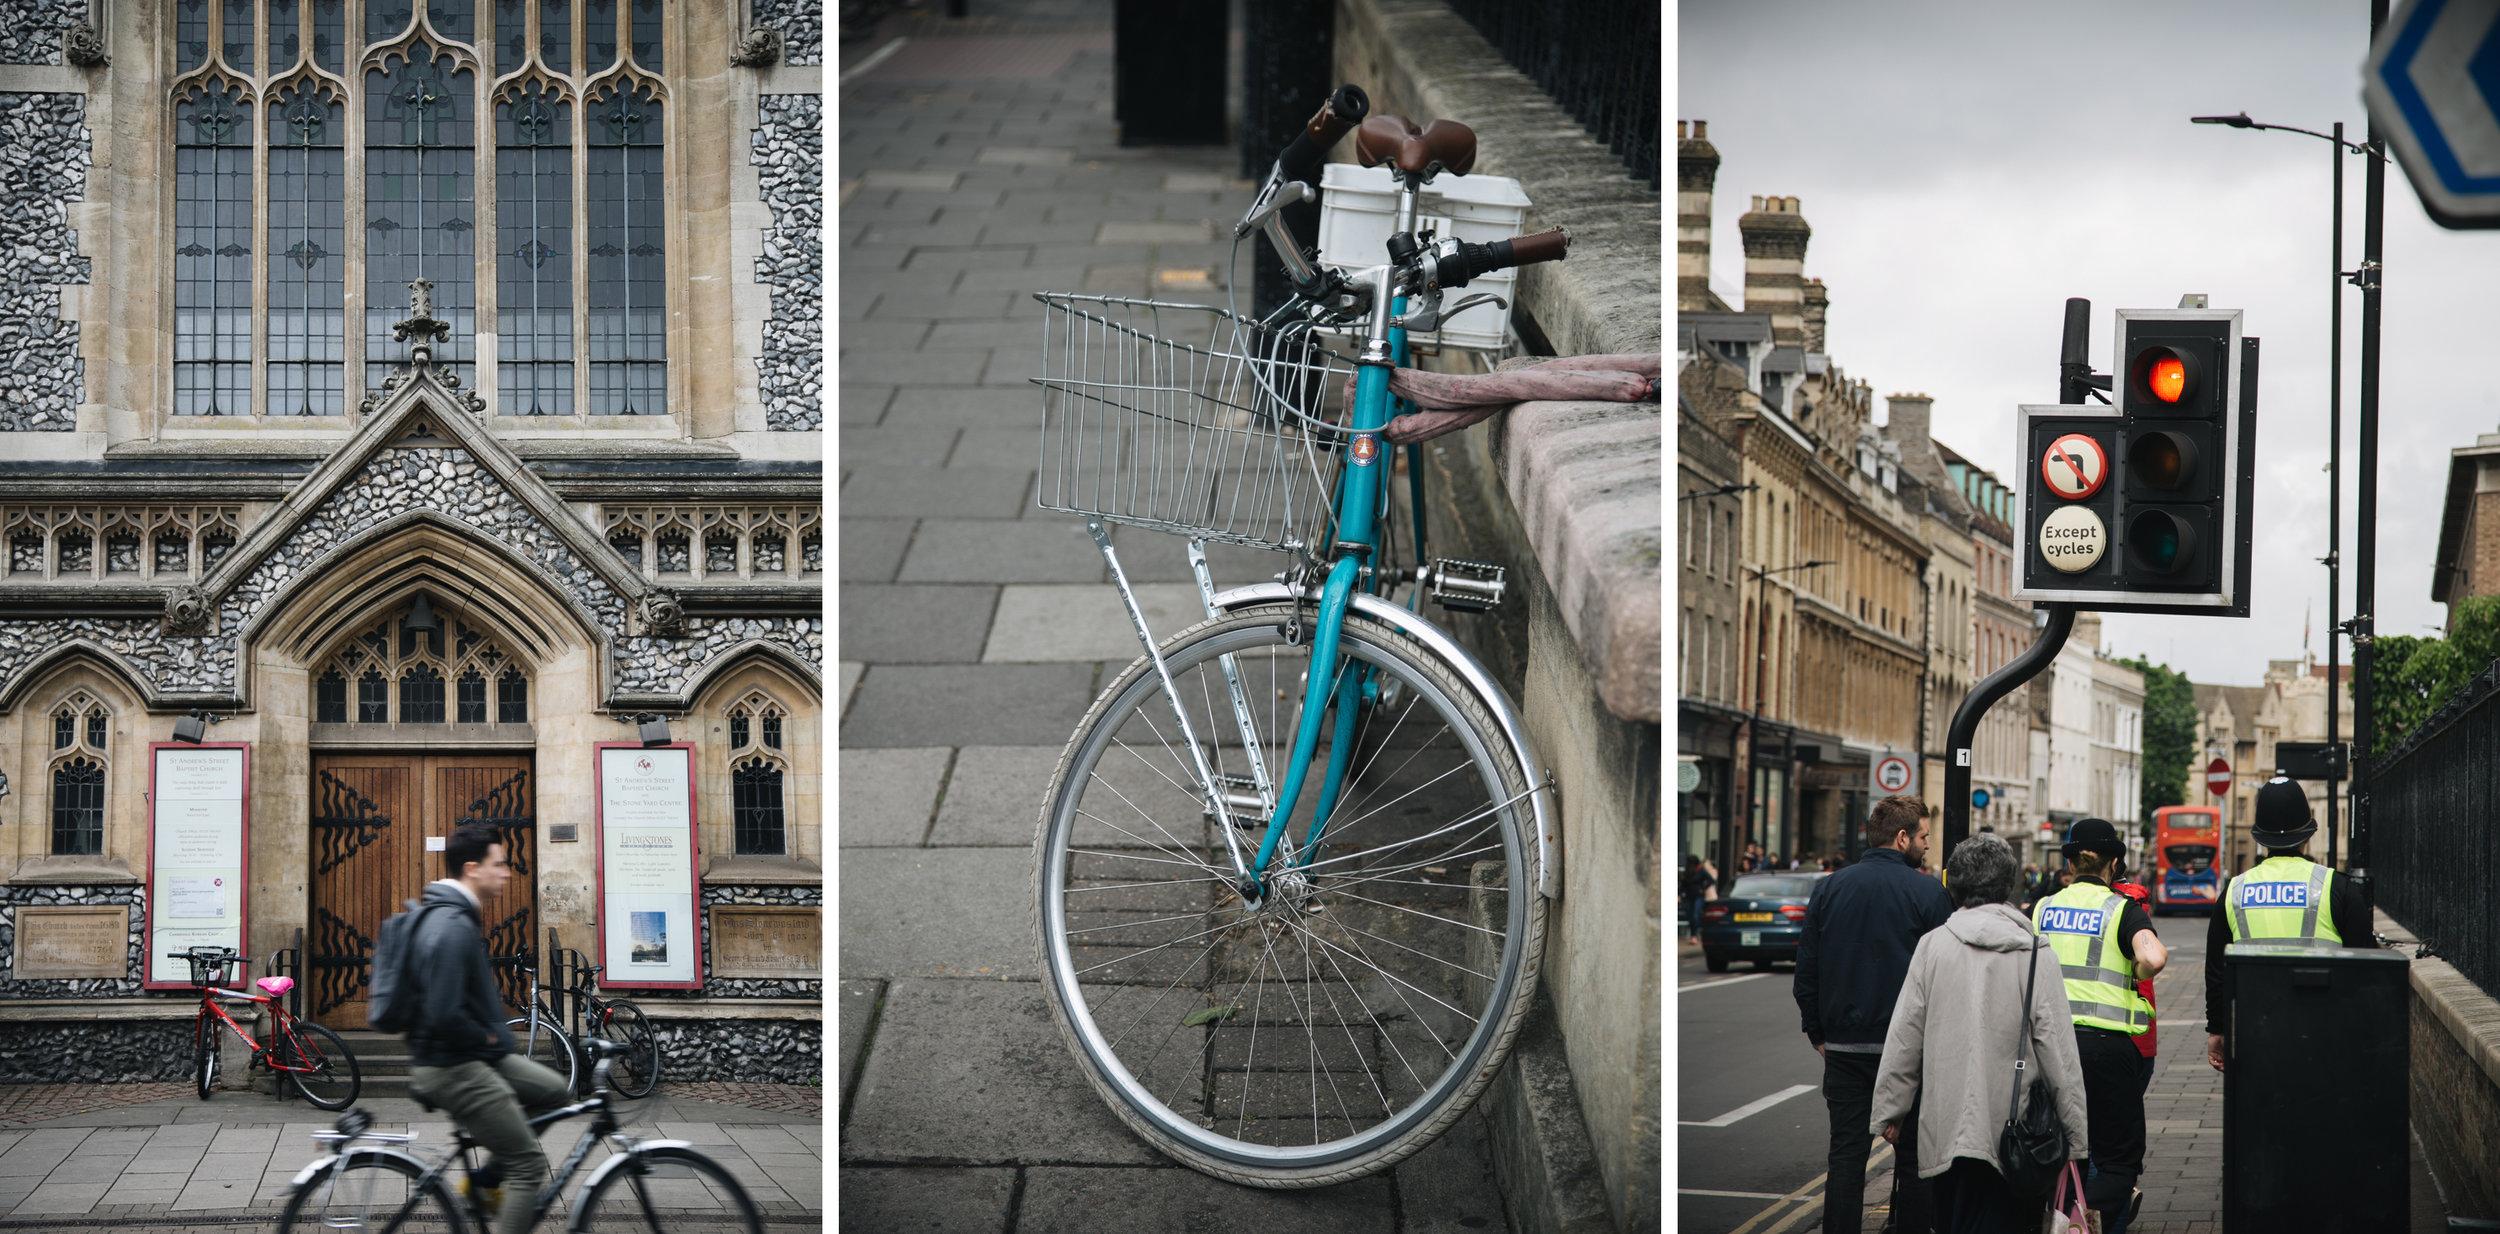 Cambridge-visiter-que-voir.jpg